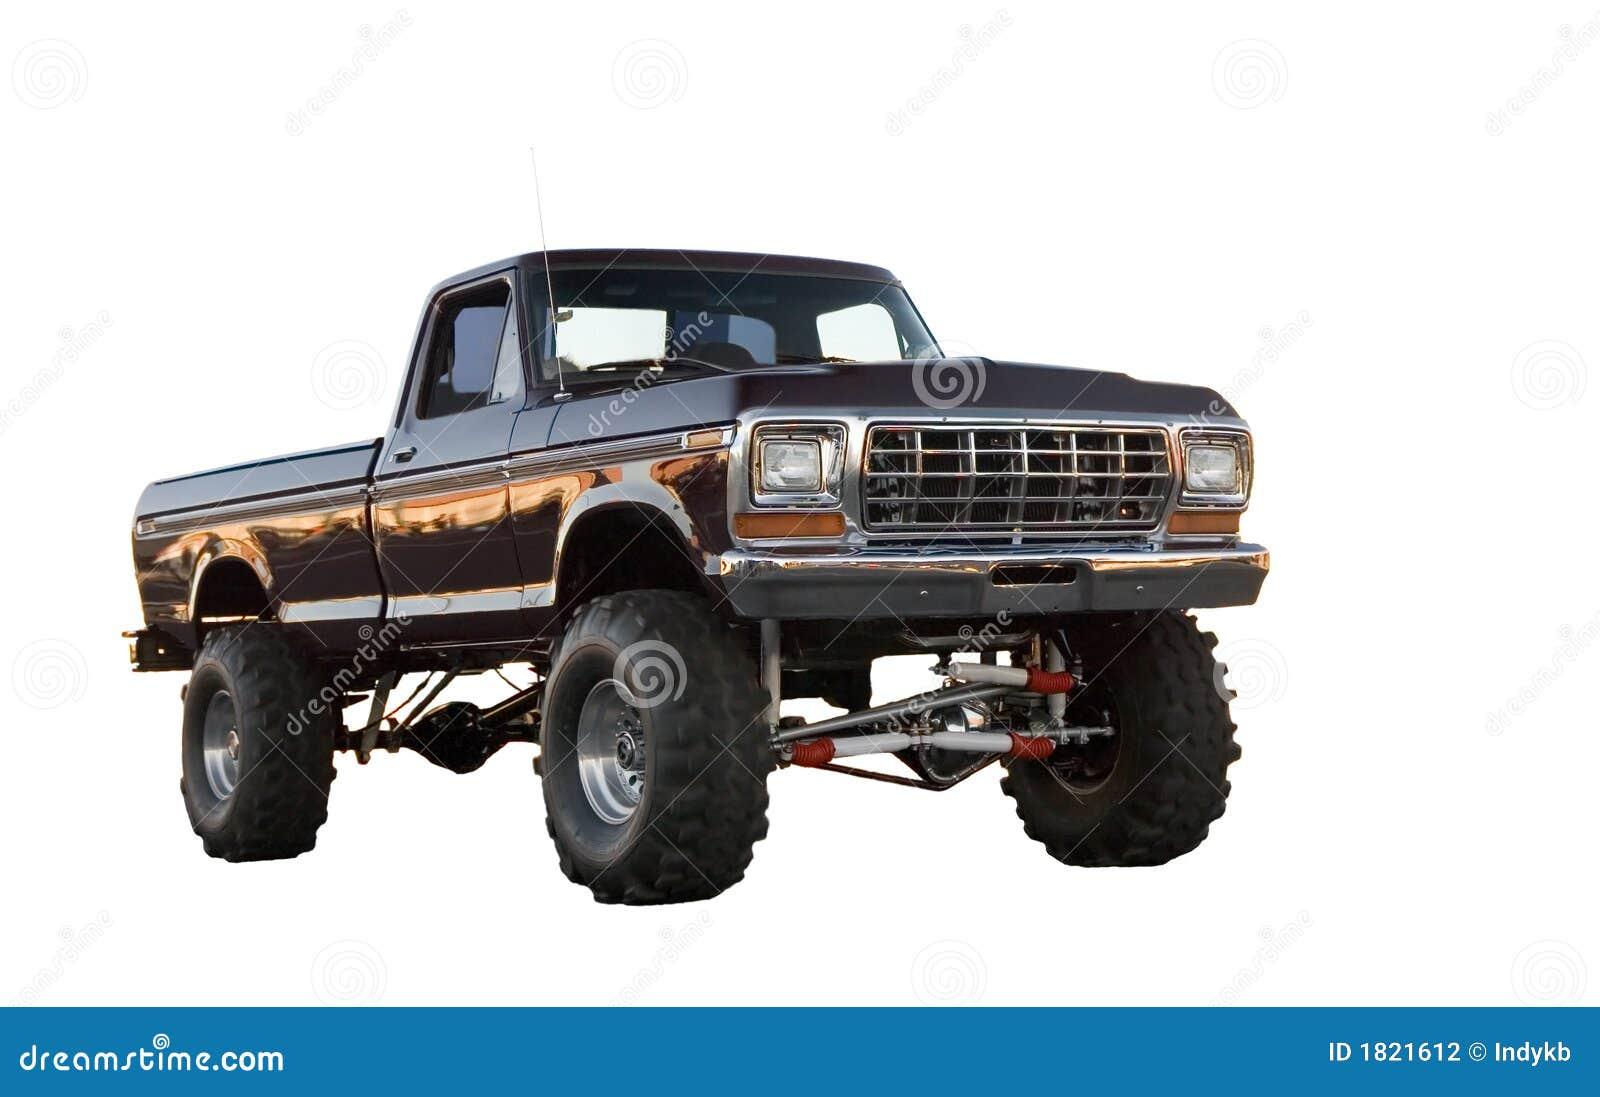 4x4 ford ranger truck stock photography image 1821612. Black Bedroom Furniture Sets. Home Design Ideas